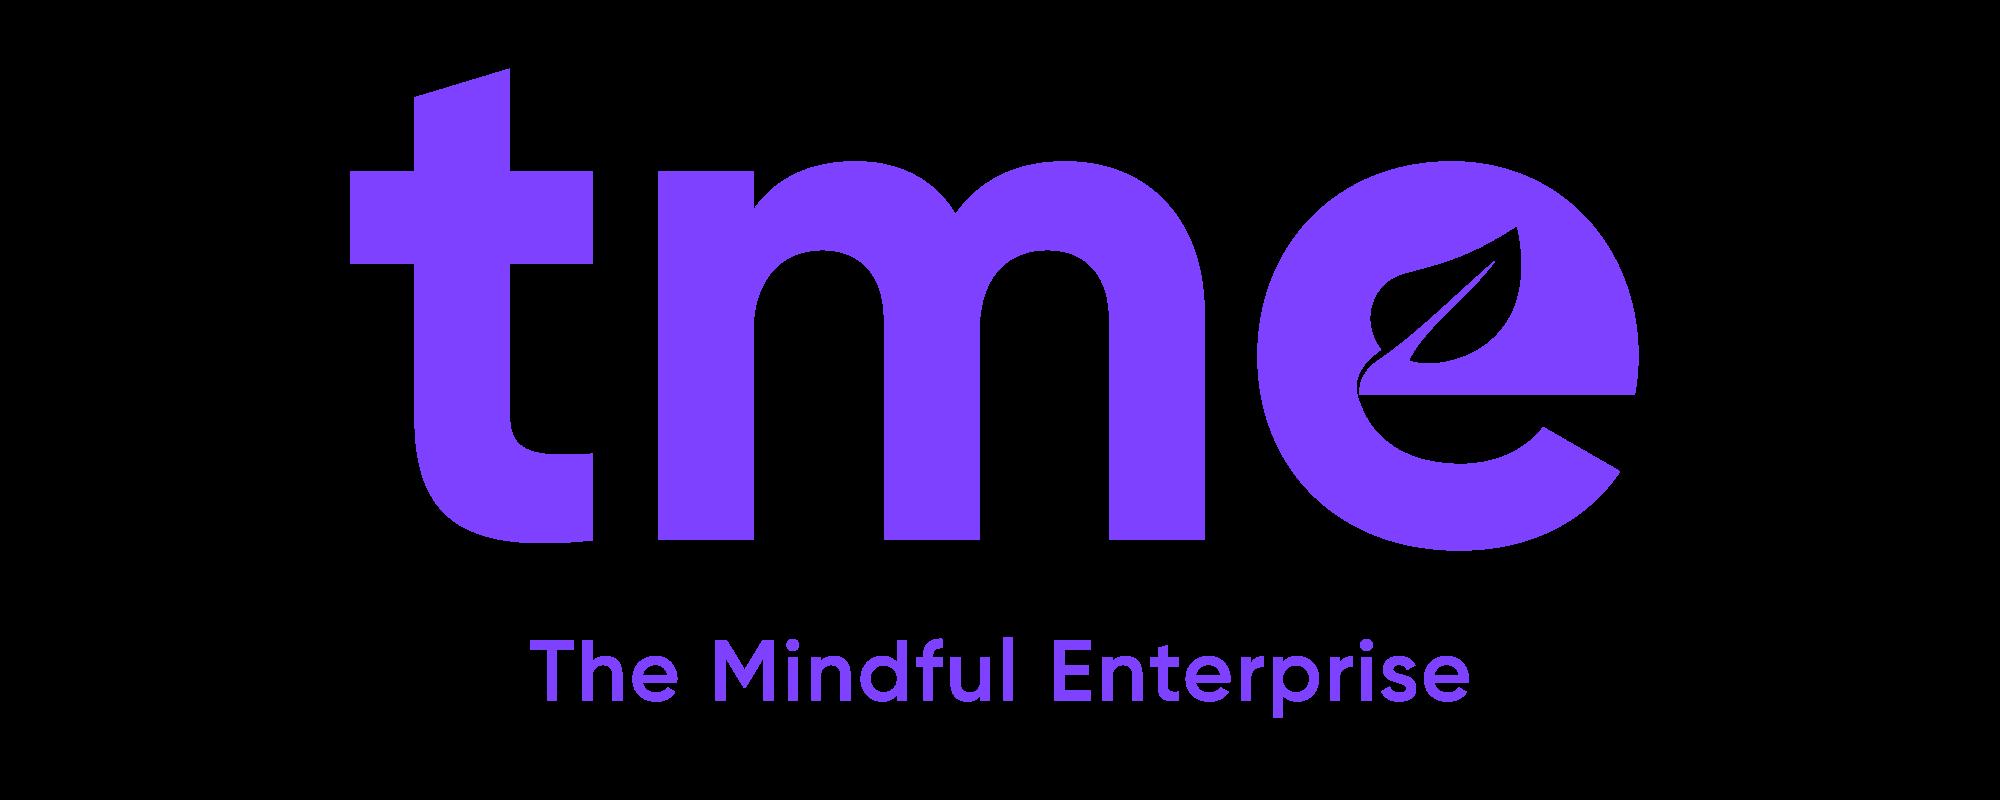 The Mindful Enterprise